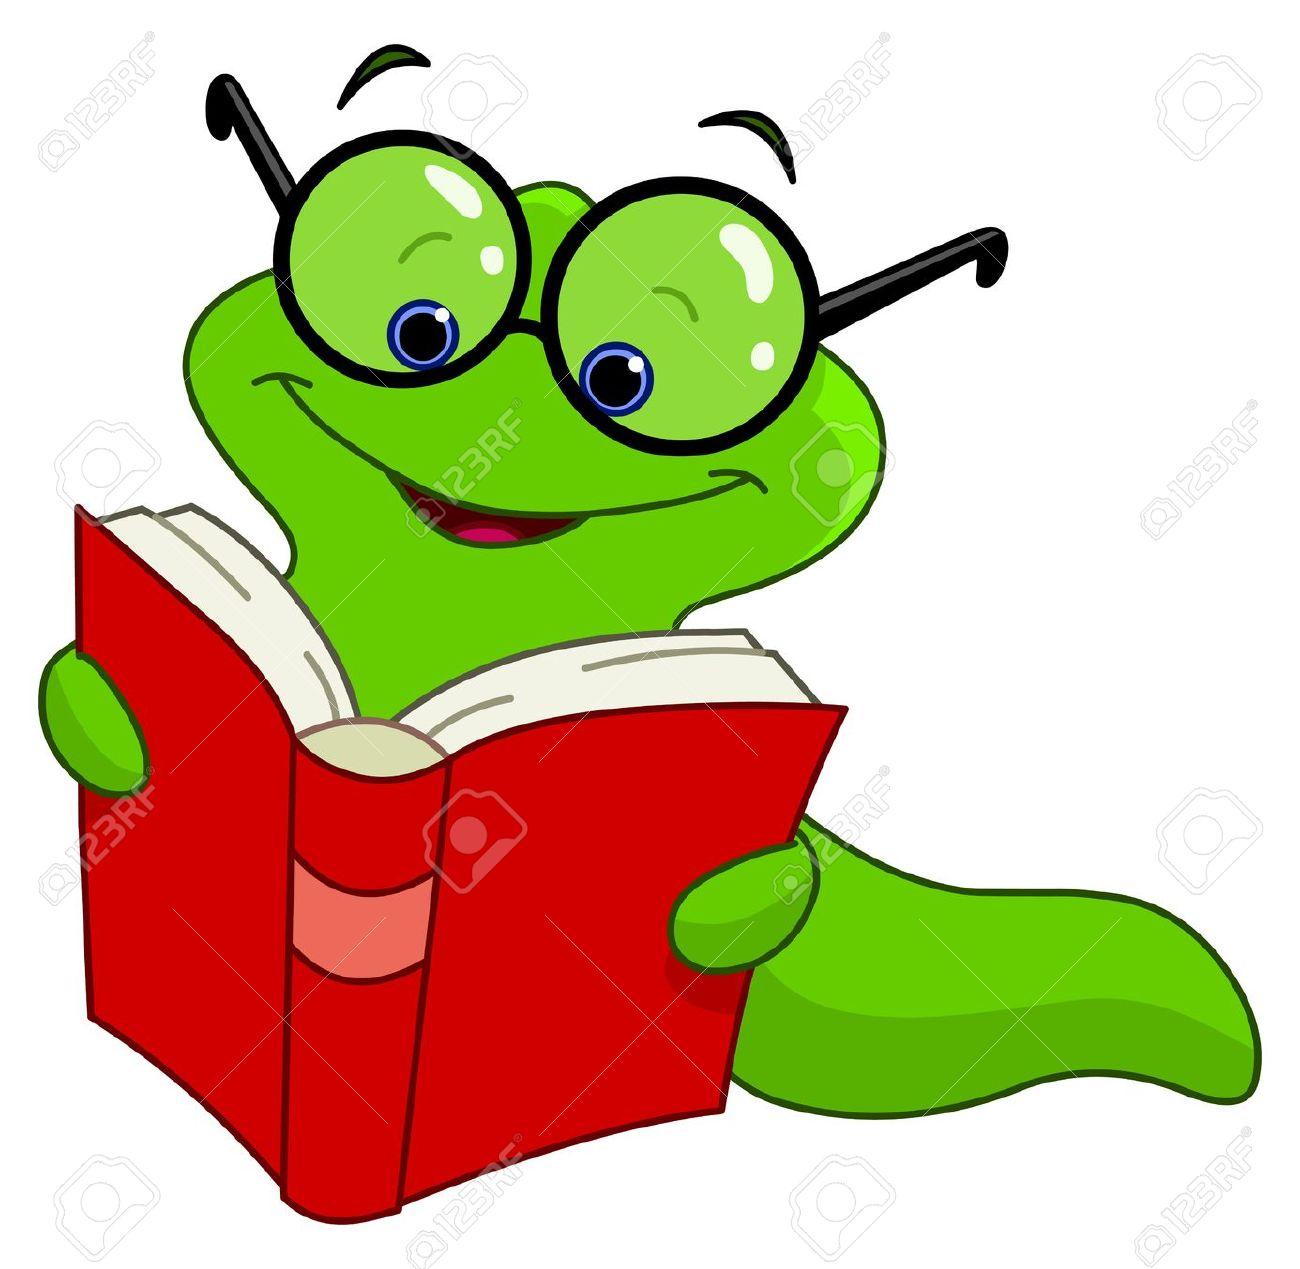 book worm: Book worm-book worm: Book worm-9